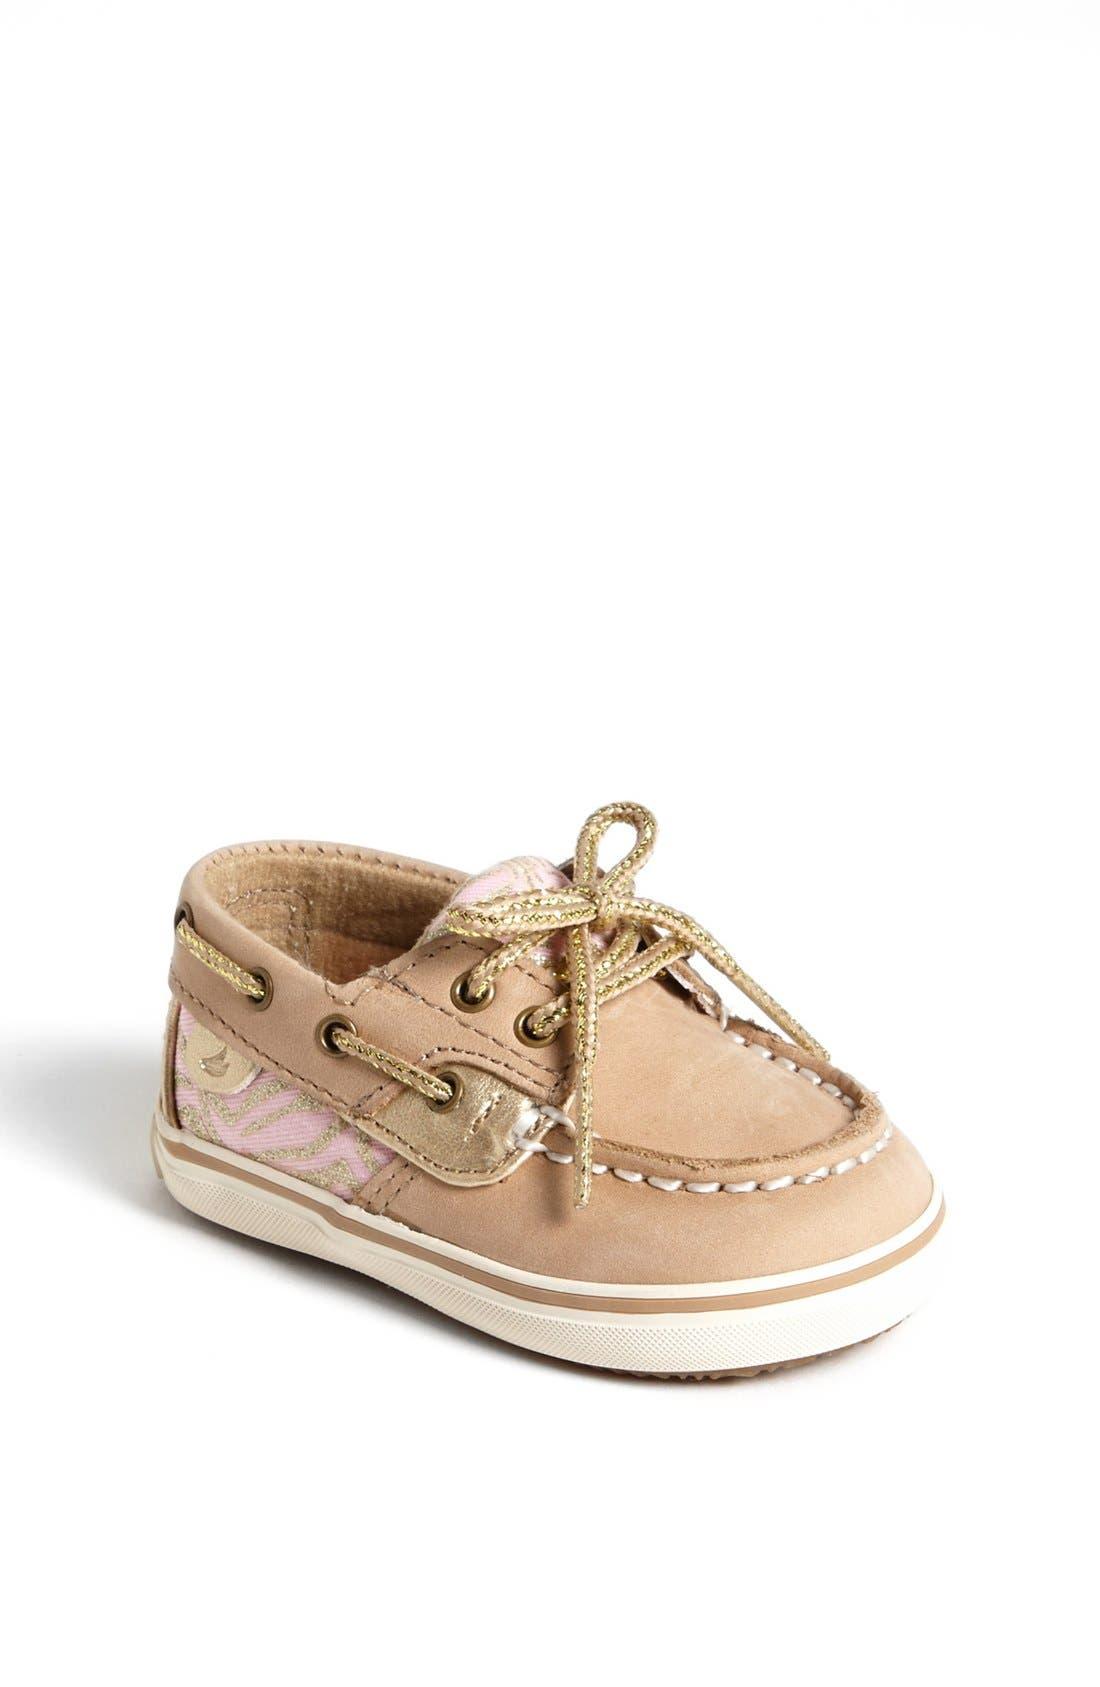 Main Image - Sperry Top-Sider® Kids 'Bluefish' Crib Shoe (Baby)